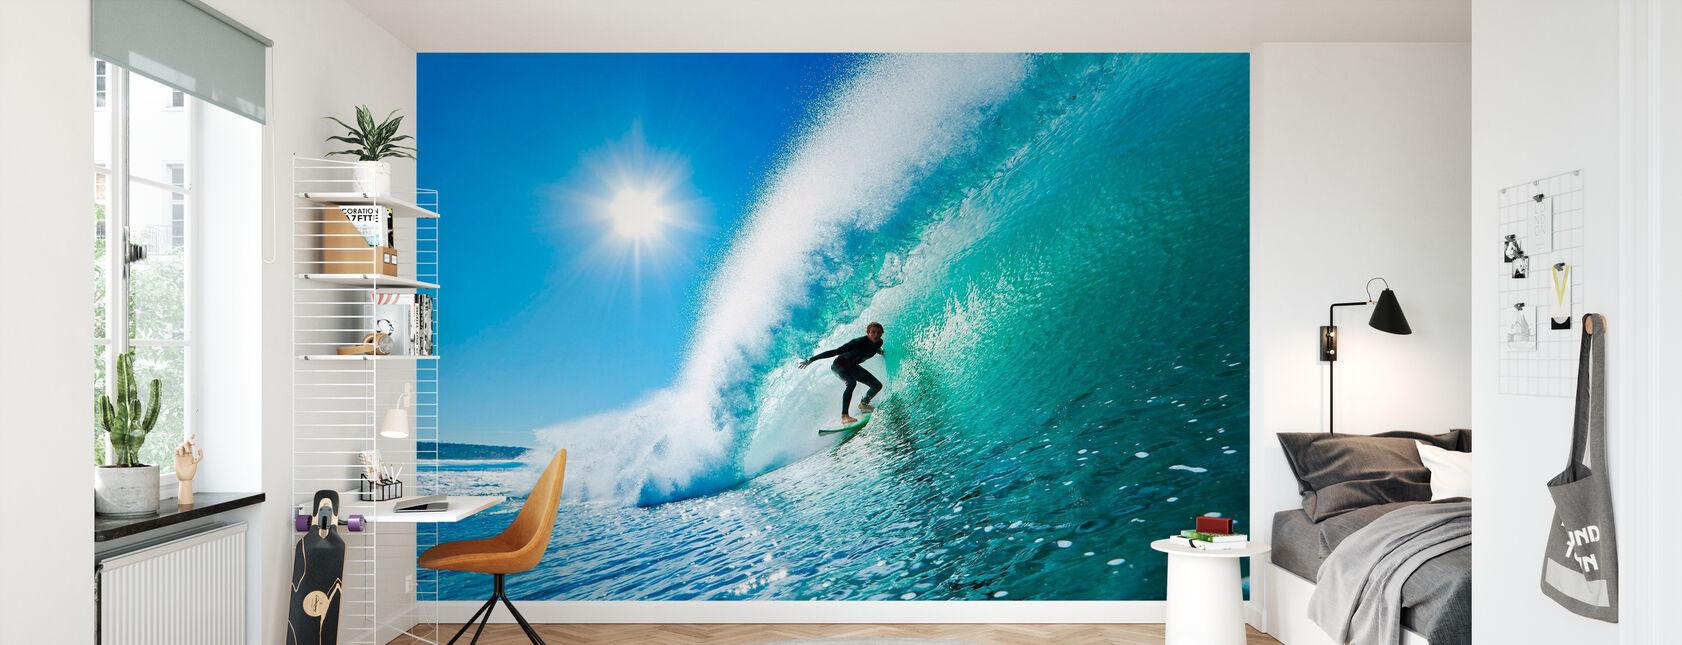 Surfing - Wallpaper - Kids Room